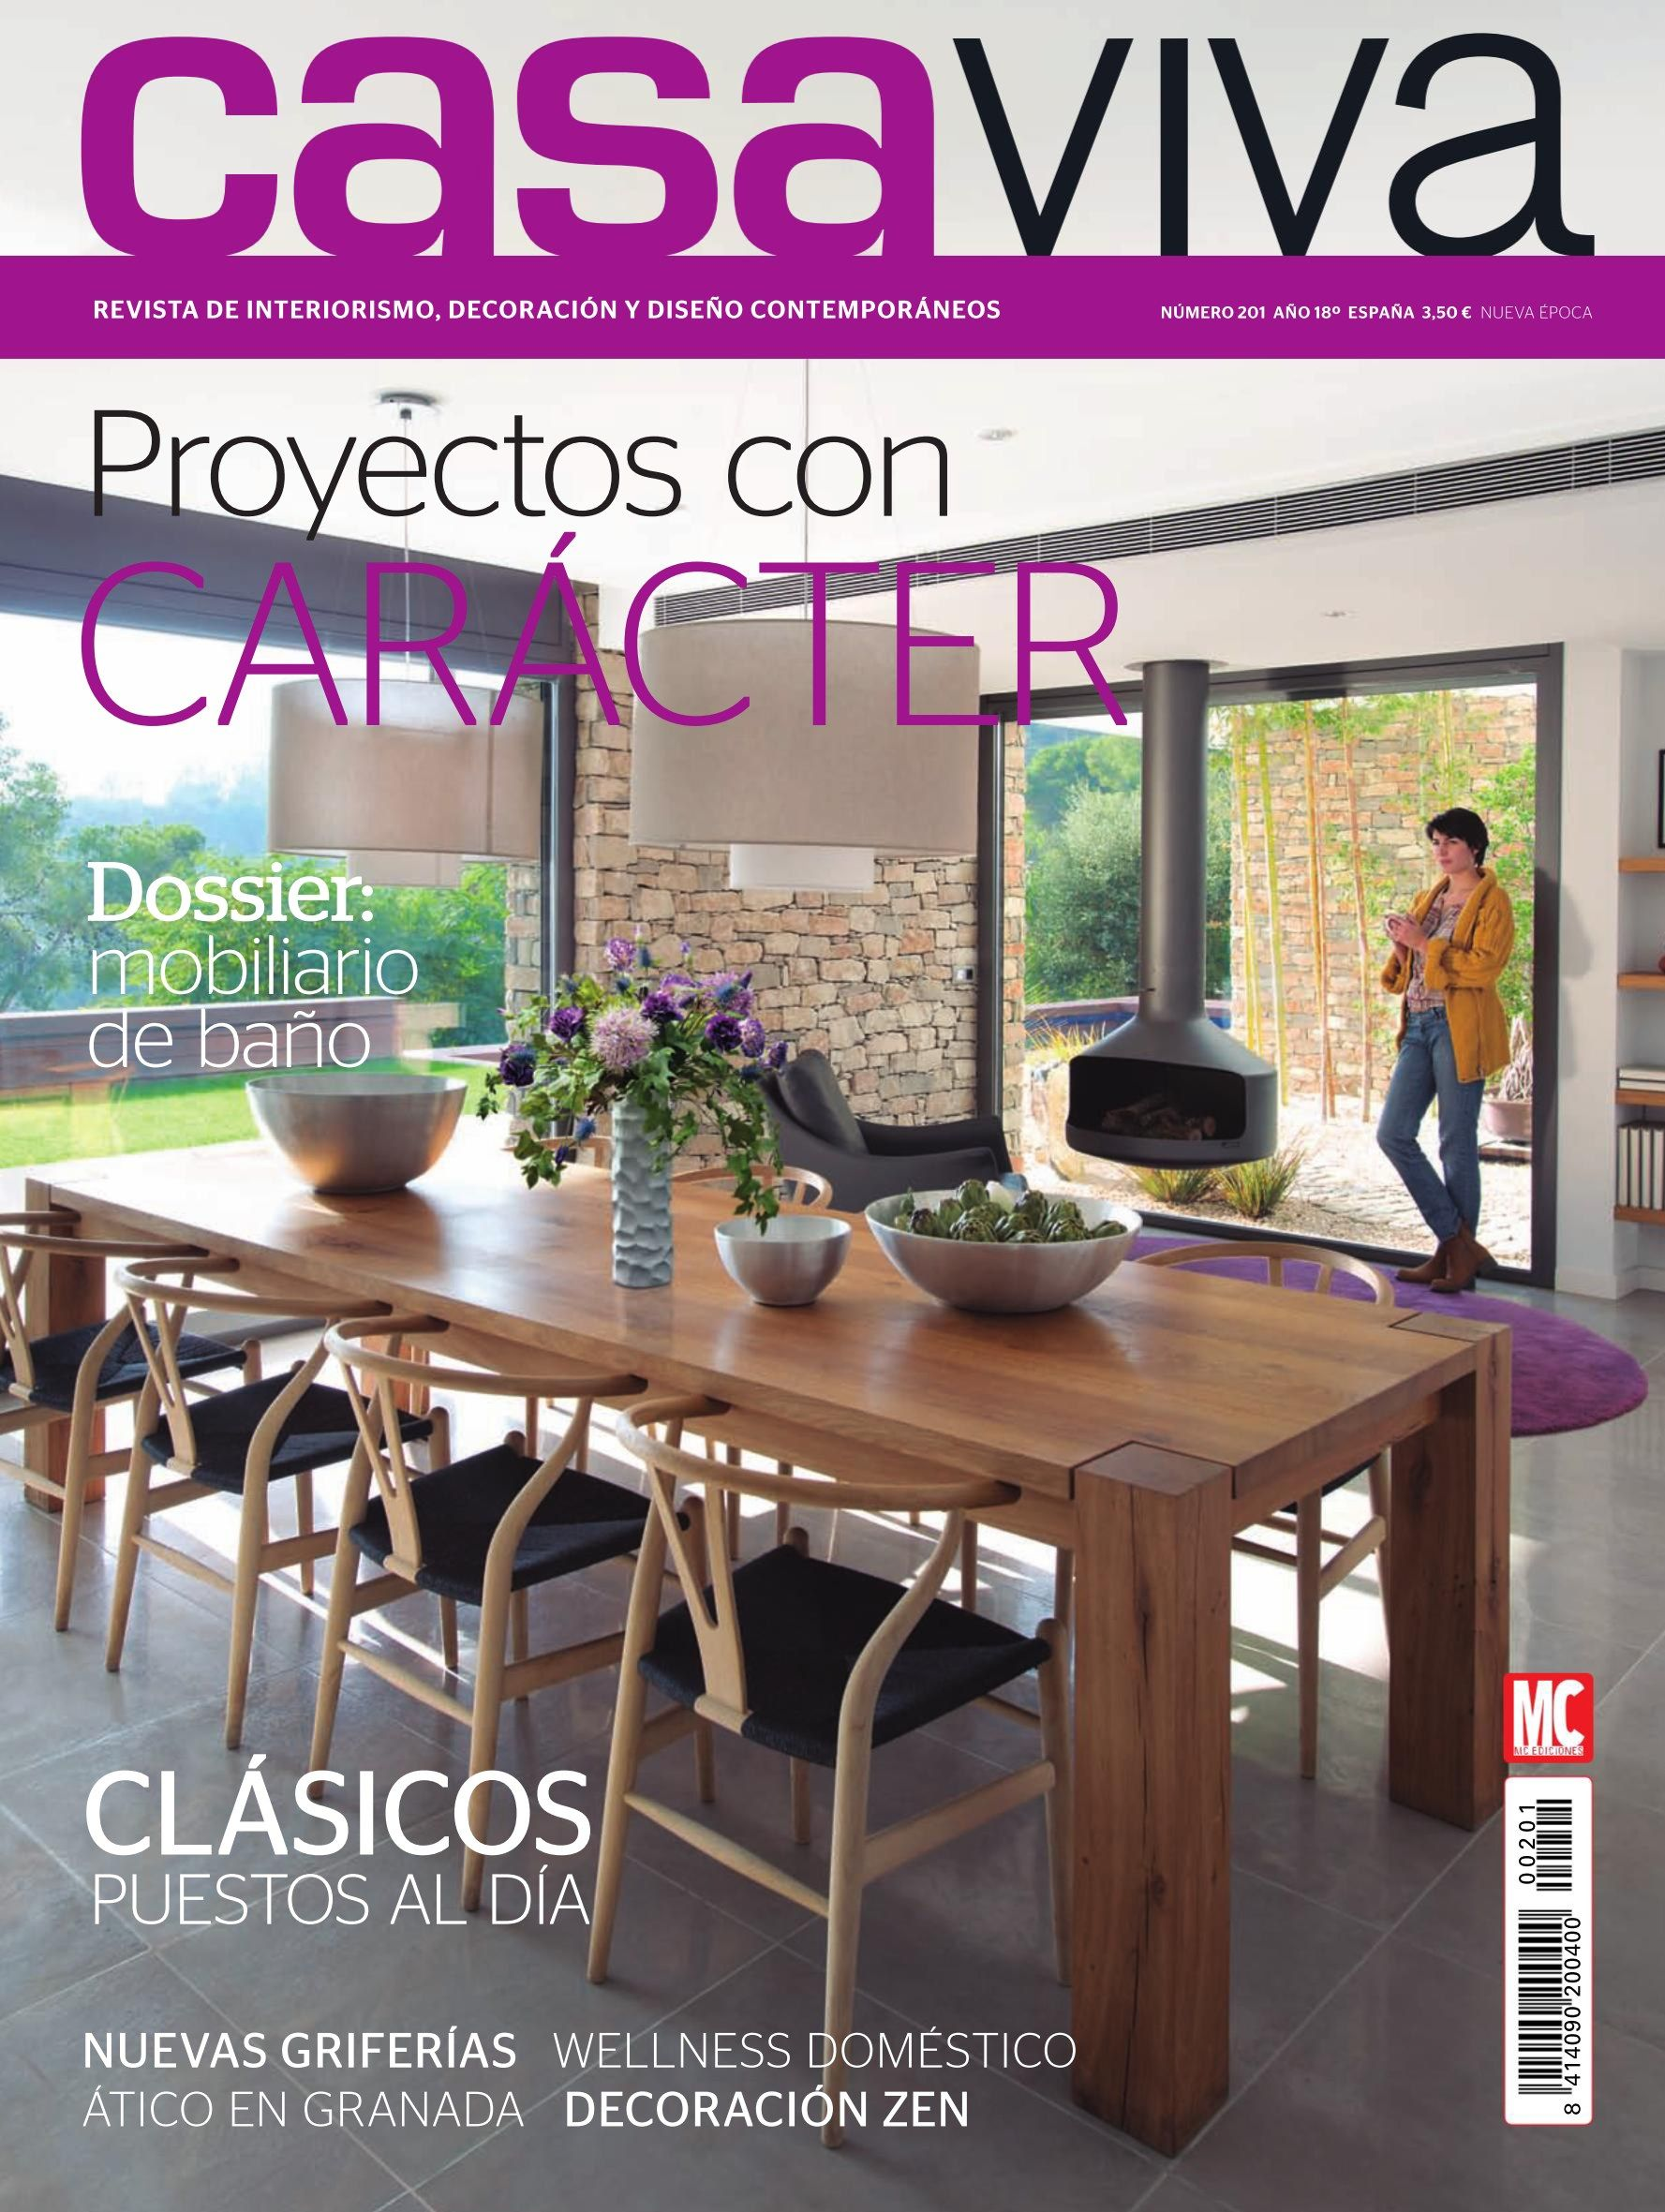 Revista casa viva 18 proyectos con car cter cl sicos for Decoracion casa viva